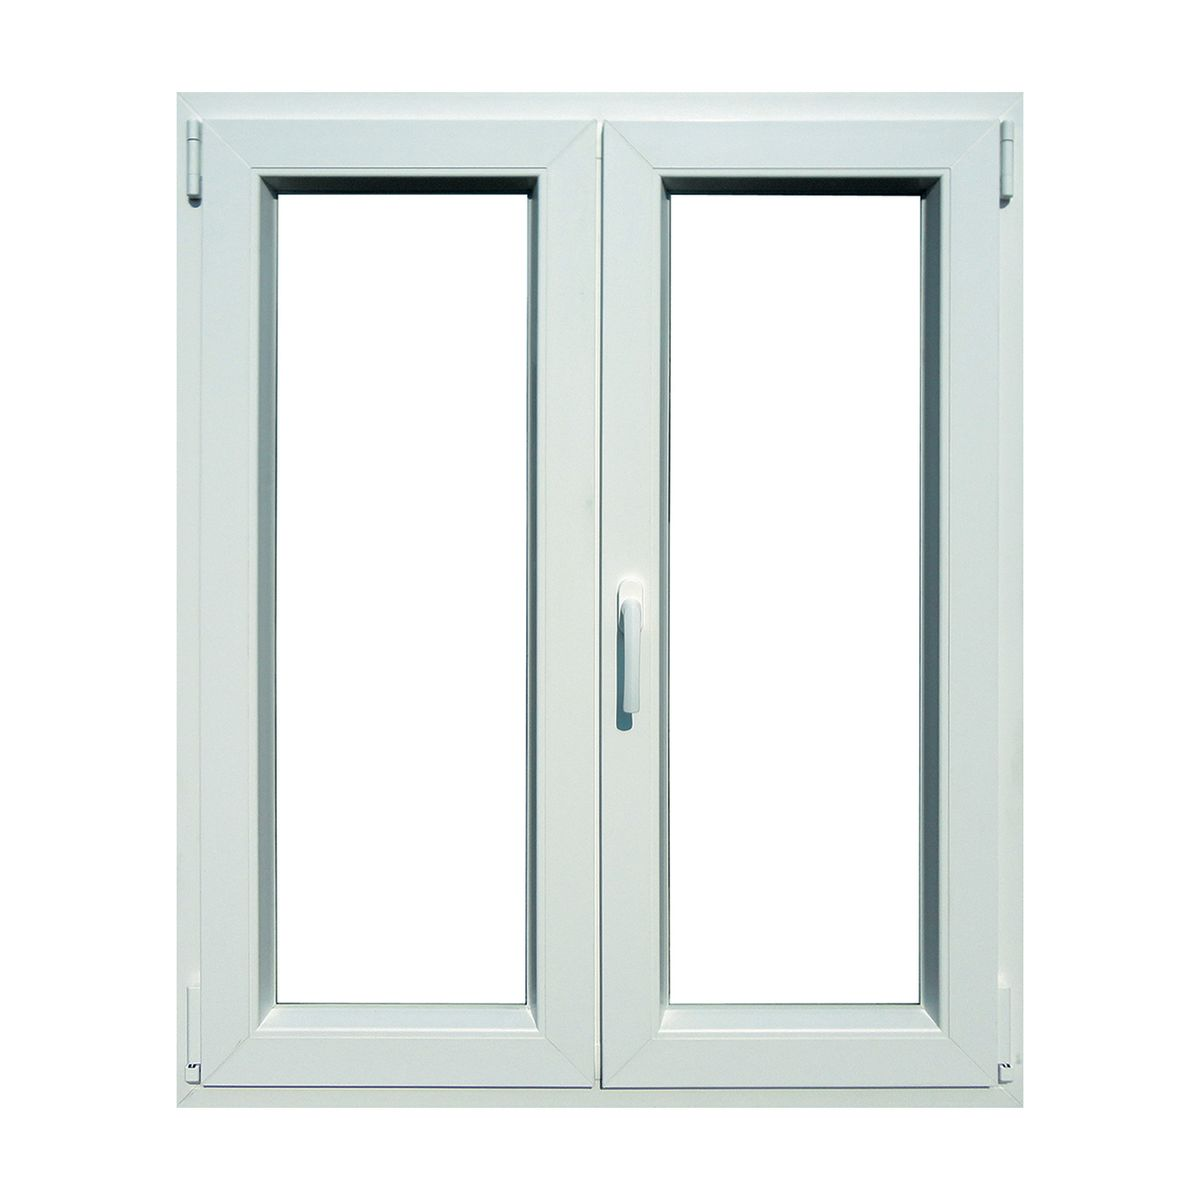 Finestre pvc misure standard great finestre pvc in offerta with finestre pvc misure standard - Misure standard finestre ...